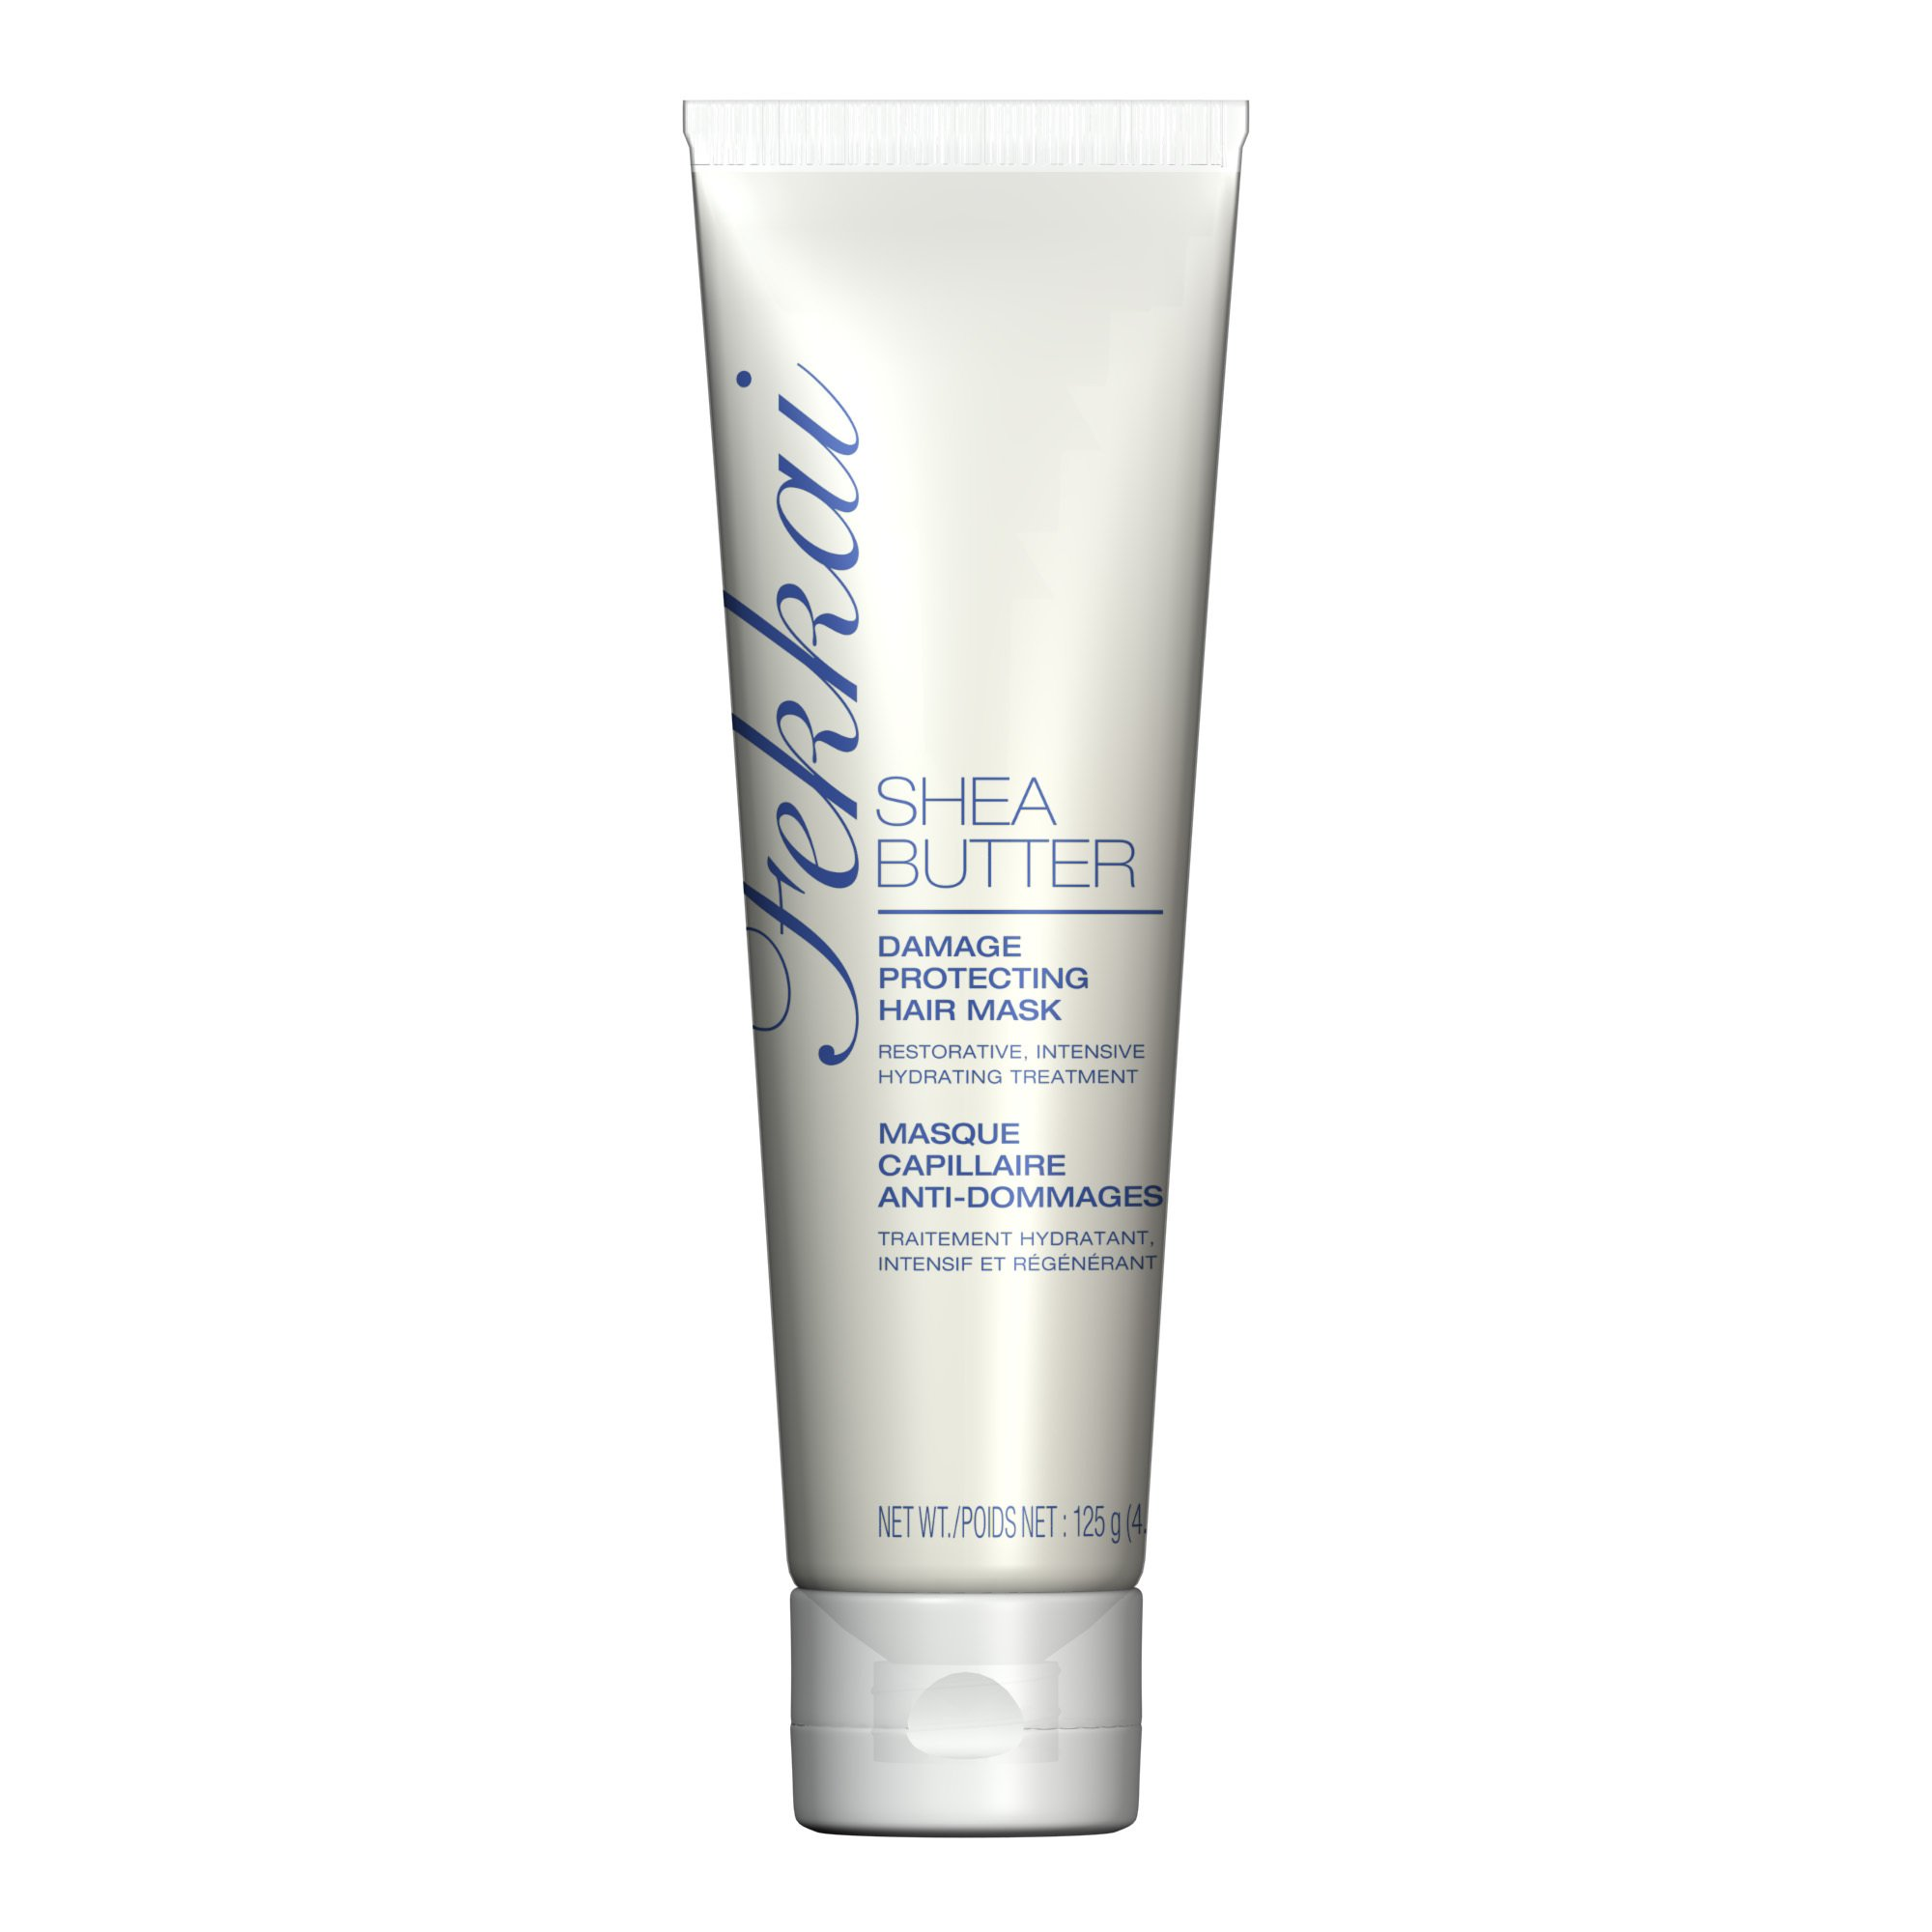 Fekkai Shea Butter Damage Protecting Hair Mask 4.4 Oz